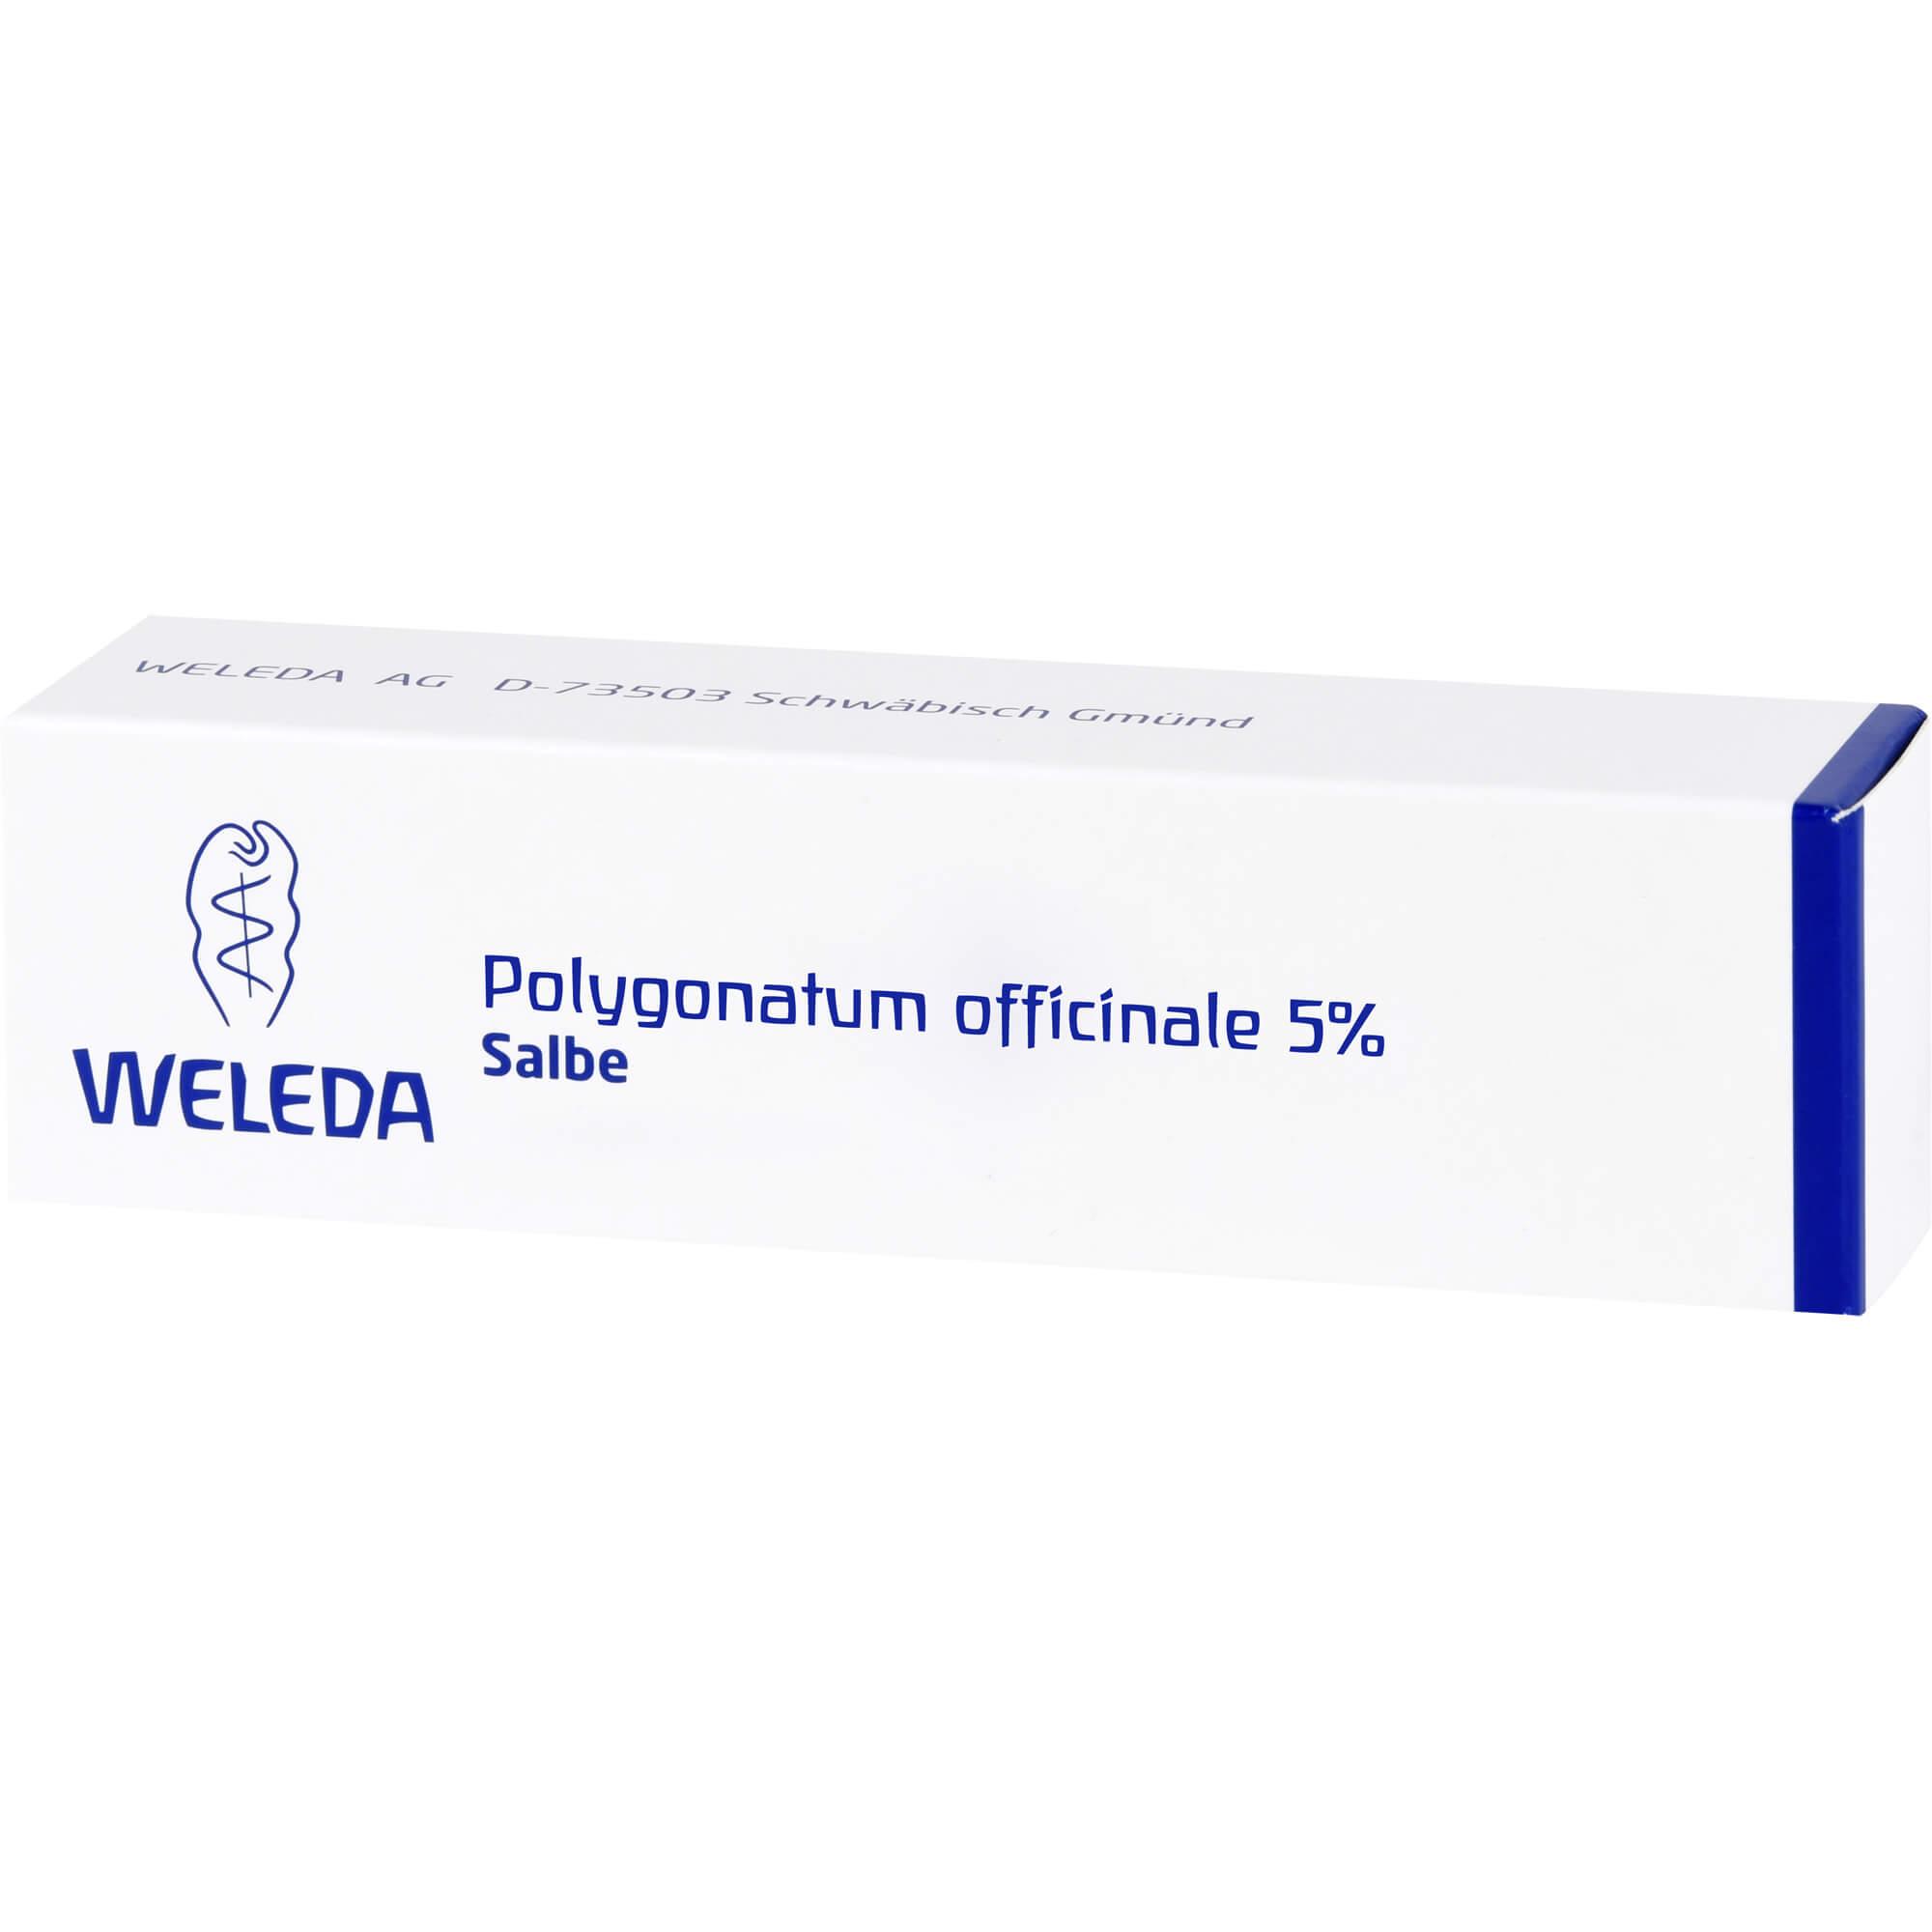 Polygonatum Officinale 5% Salbe